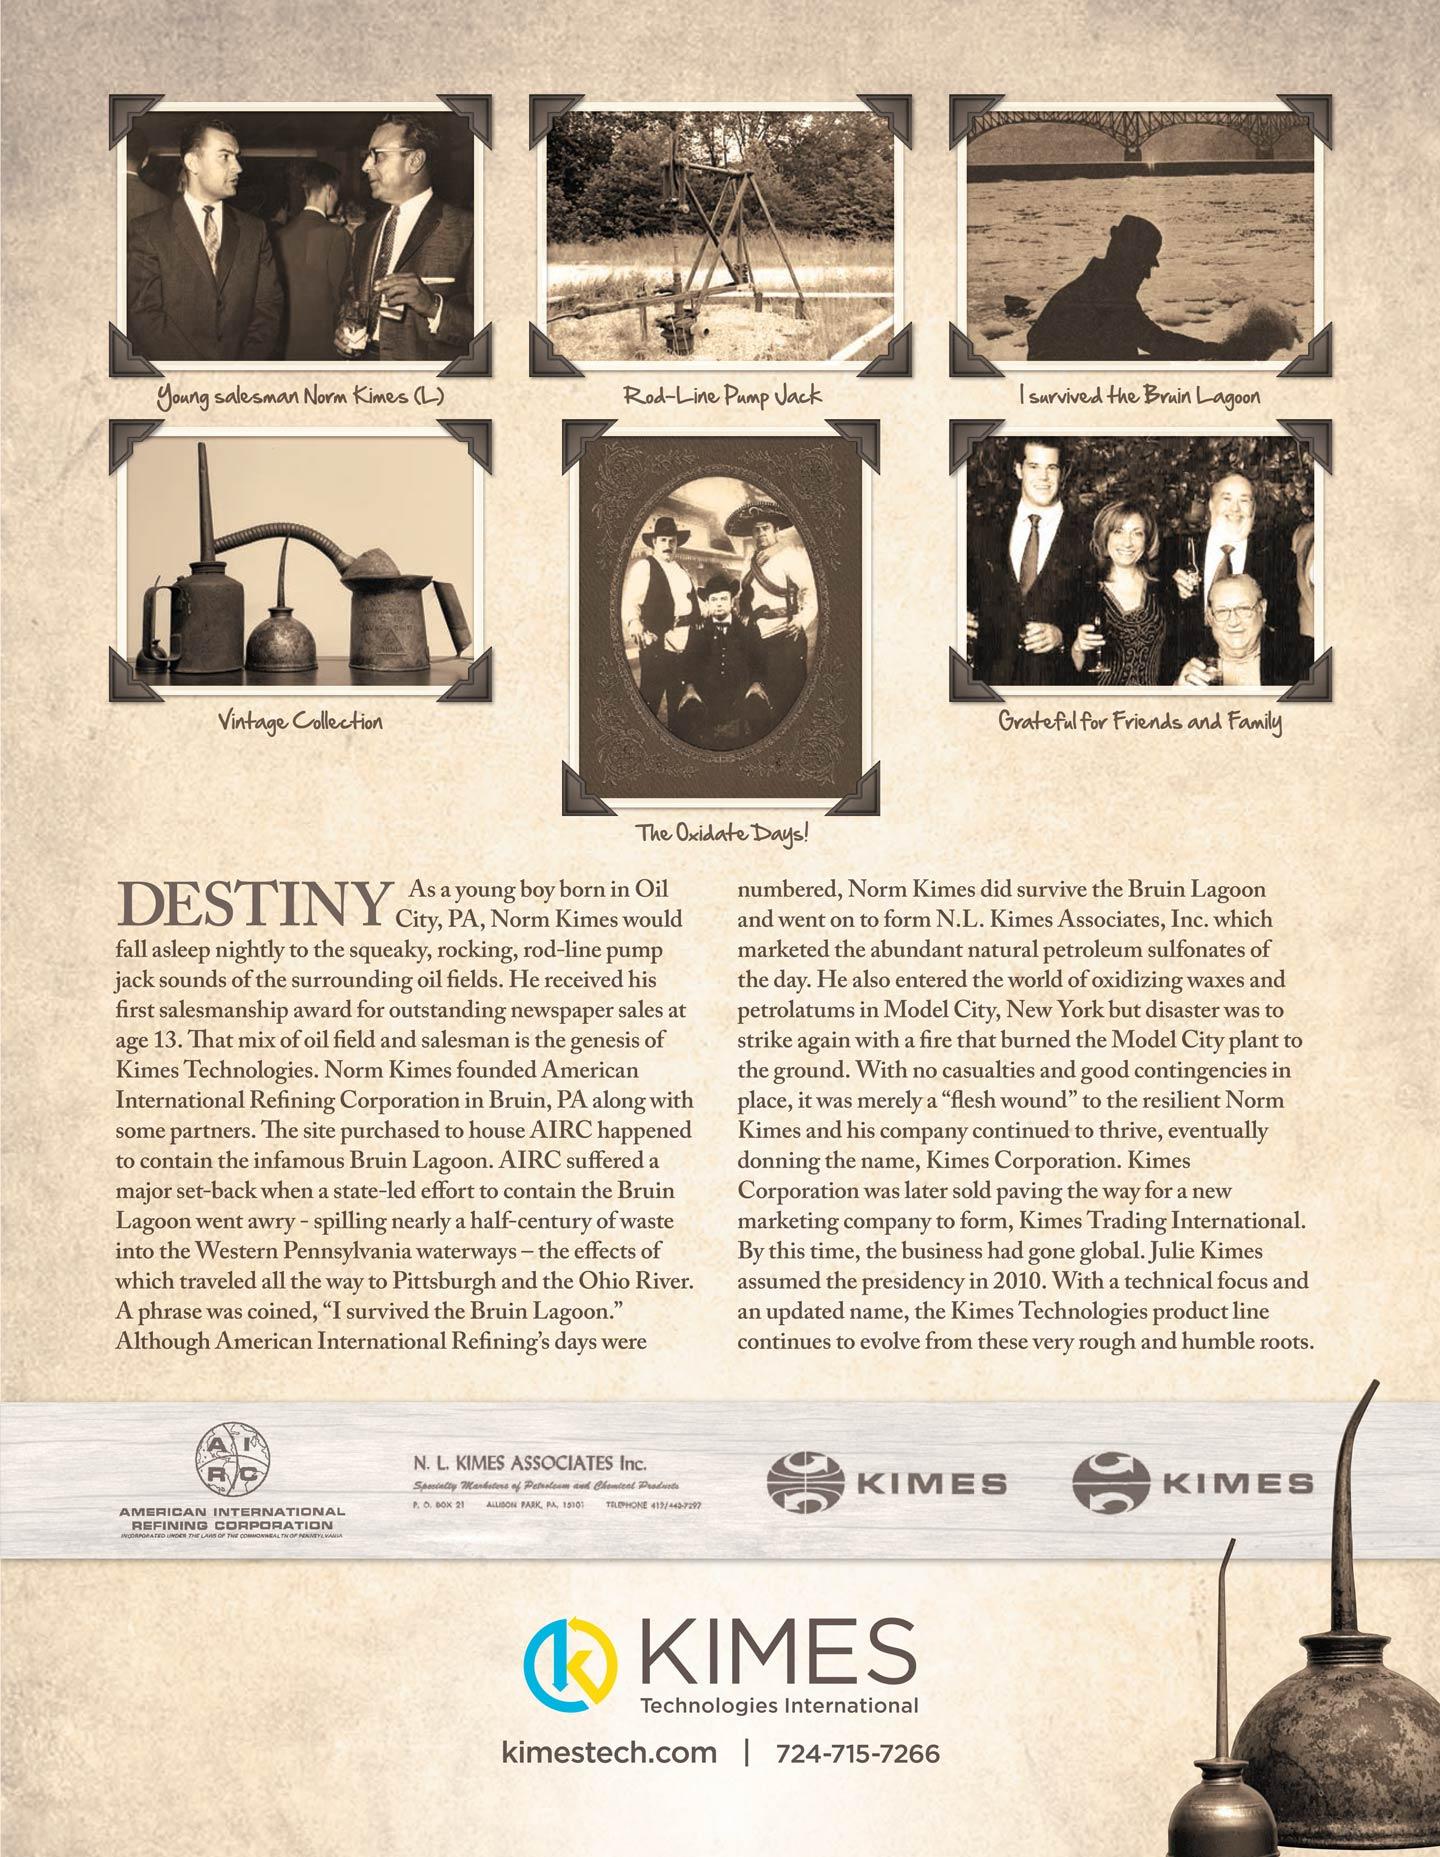 Kimes 25th Anniversary advertisment